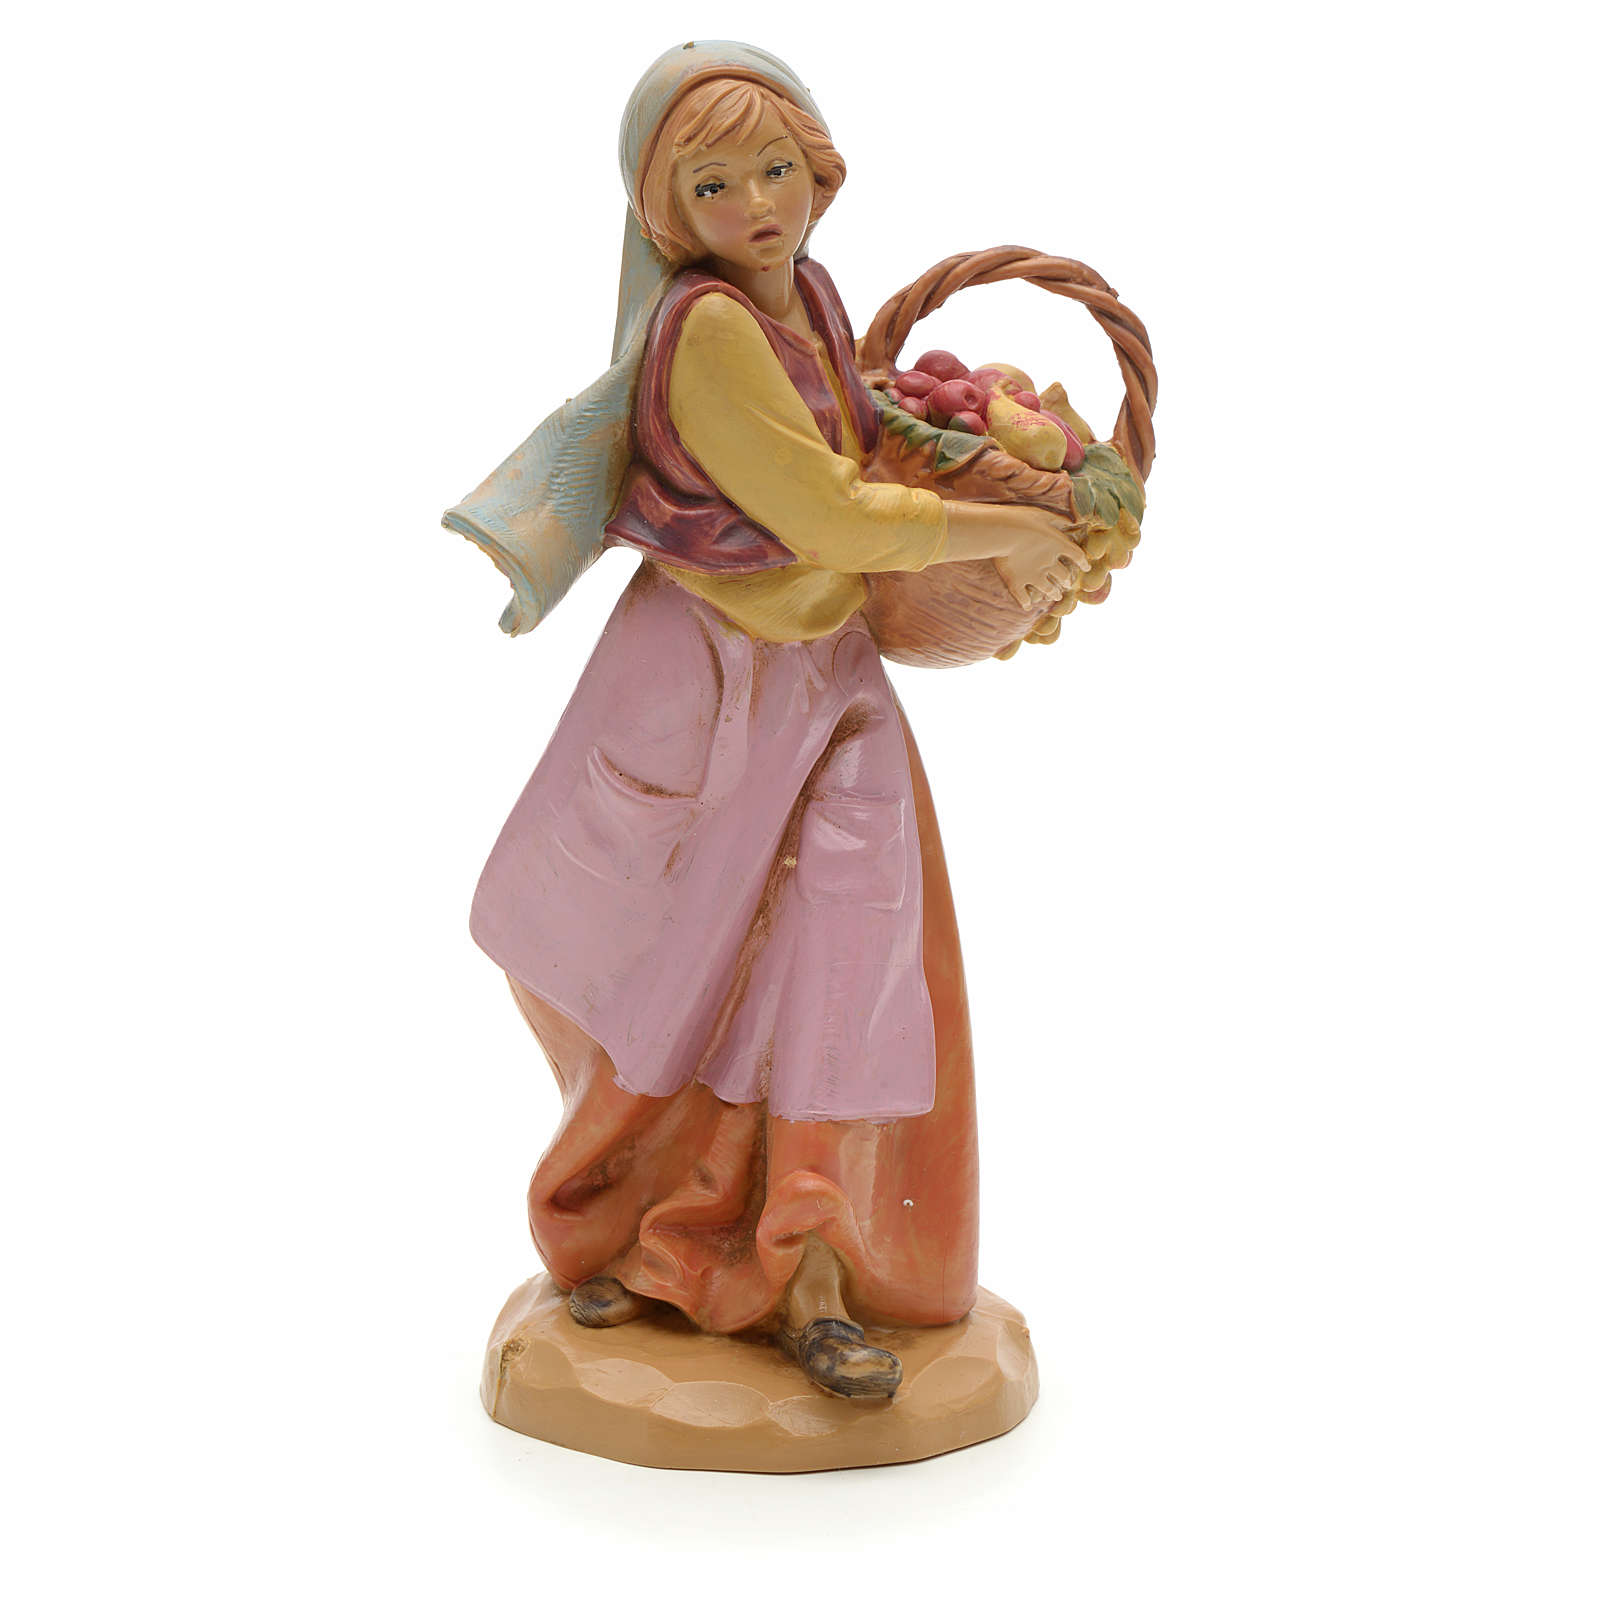 Pastora con cesta de fruta 12 cm Fontanini 3